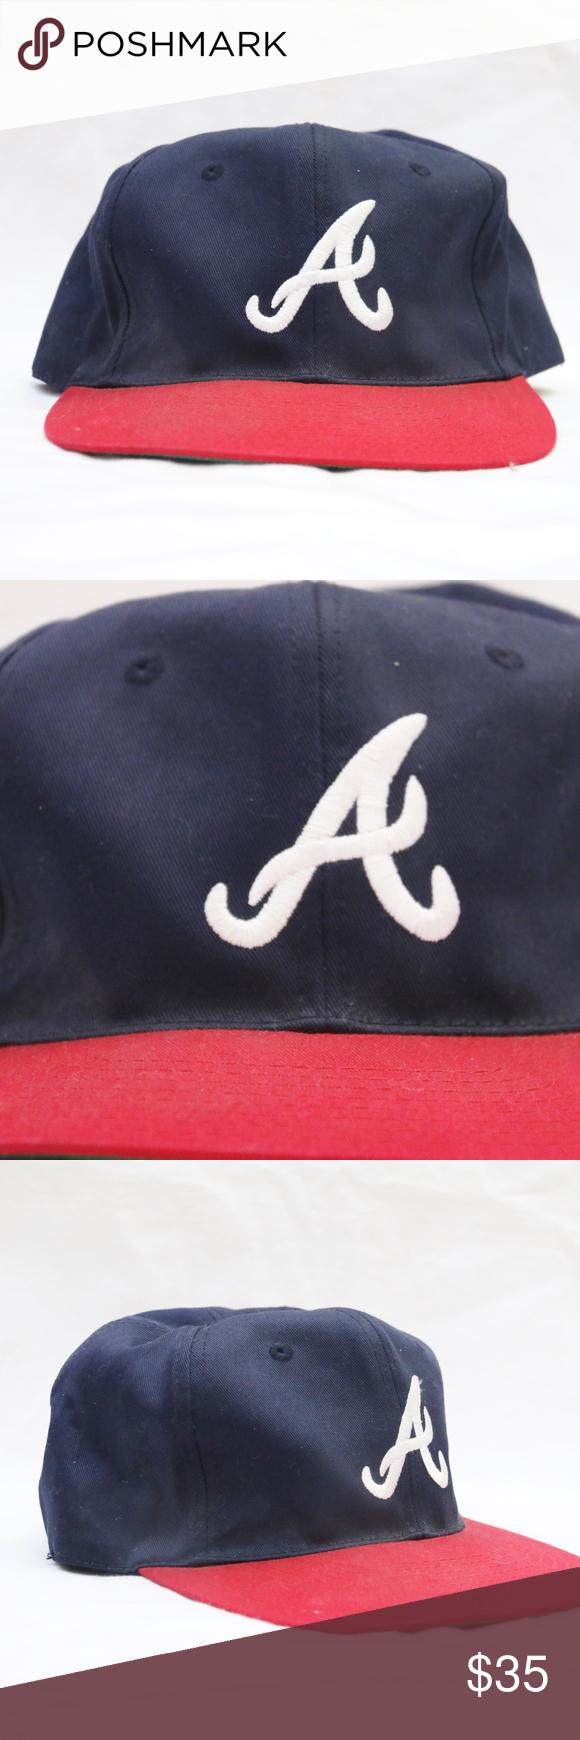 90 S Vintage Atlanta Braves Snapback W Green Brim Atlanta Braves Braves Vintage Twins